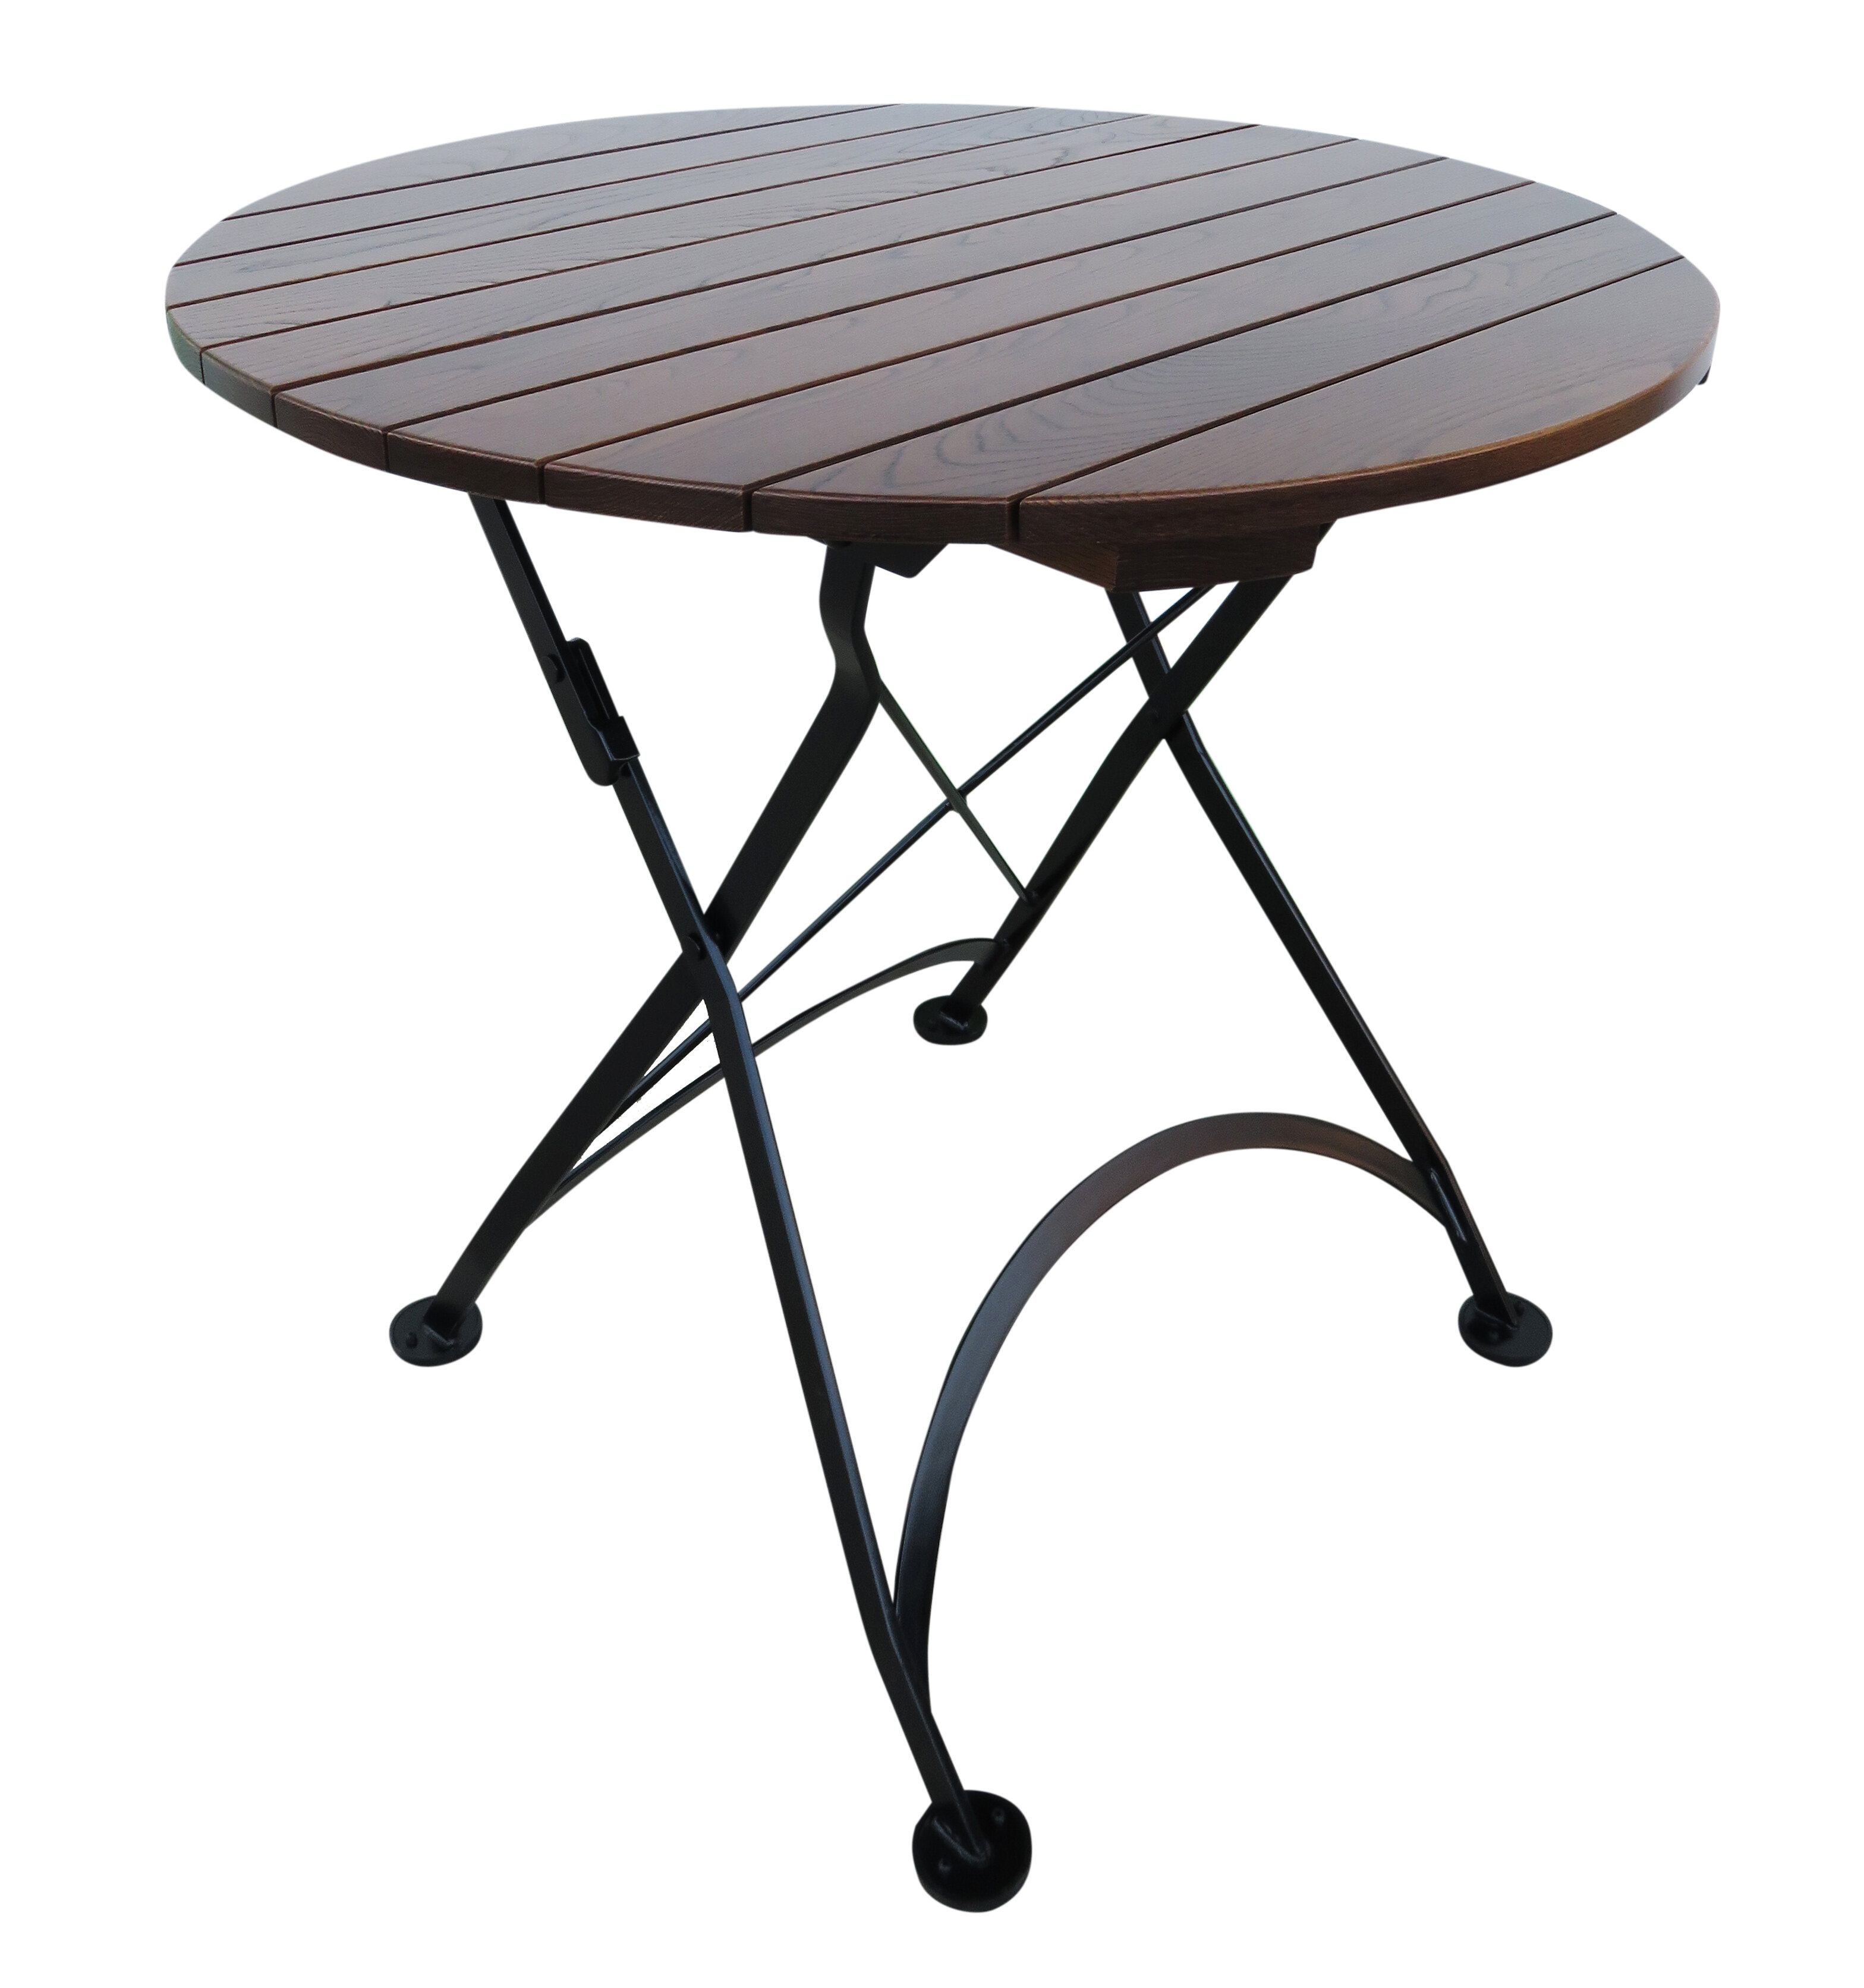 Furniture Designhouse French Café Bistro Folding Wood Table Wayfair